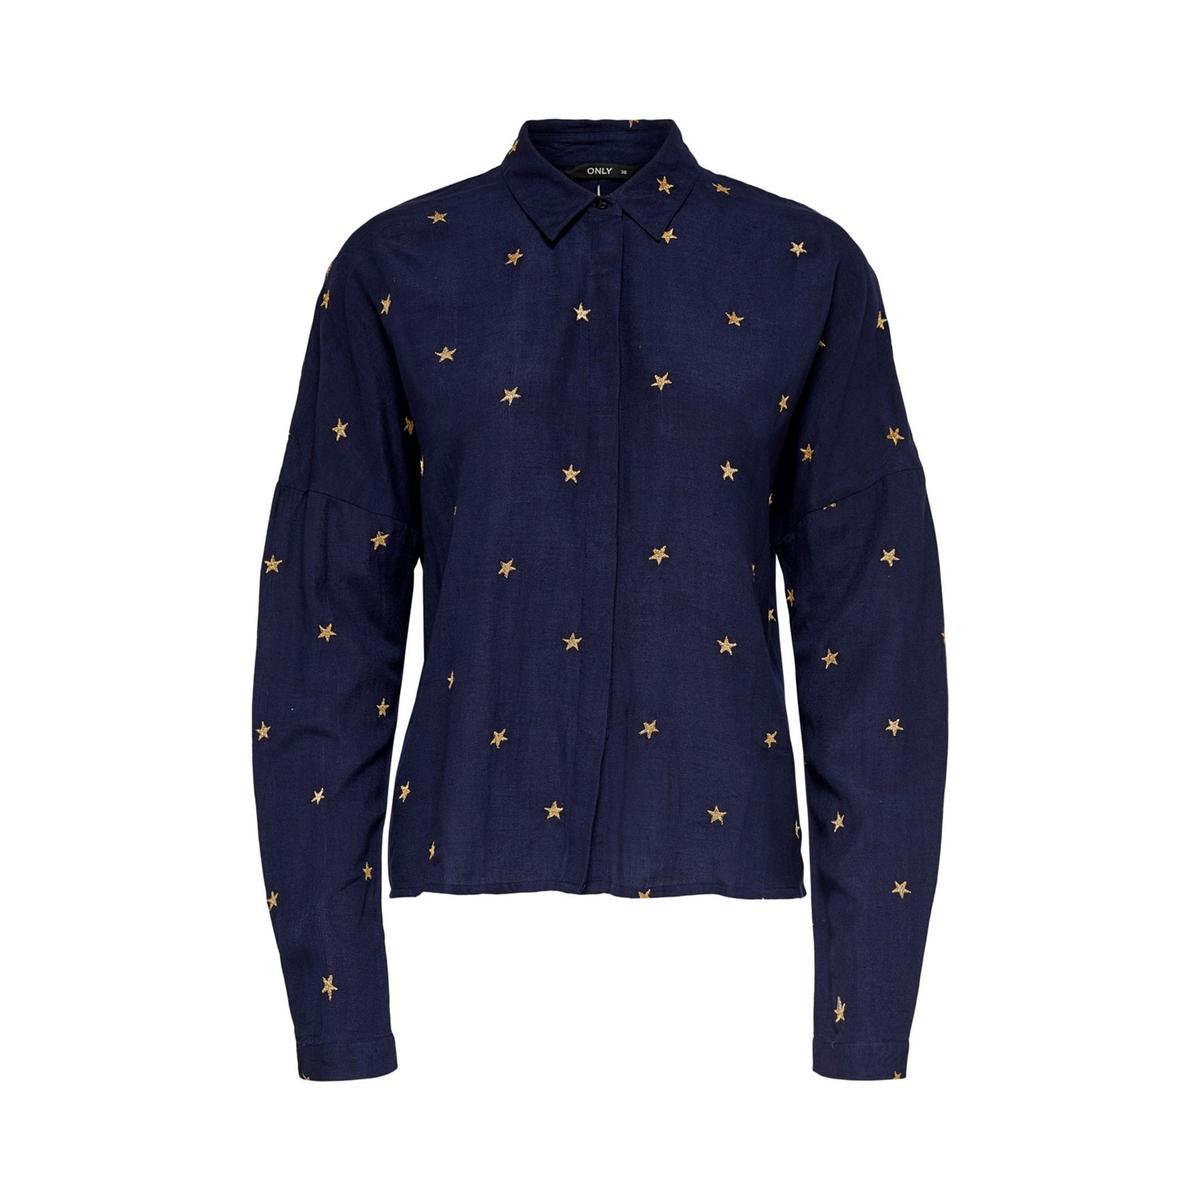 Рубашка La Redoute С принтом звезды 38 (FR) - 44 (RUS) синий брюки чино la redoute la redoute 38 fr 44 rus синий